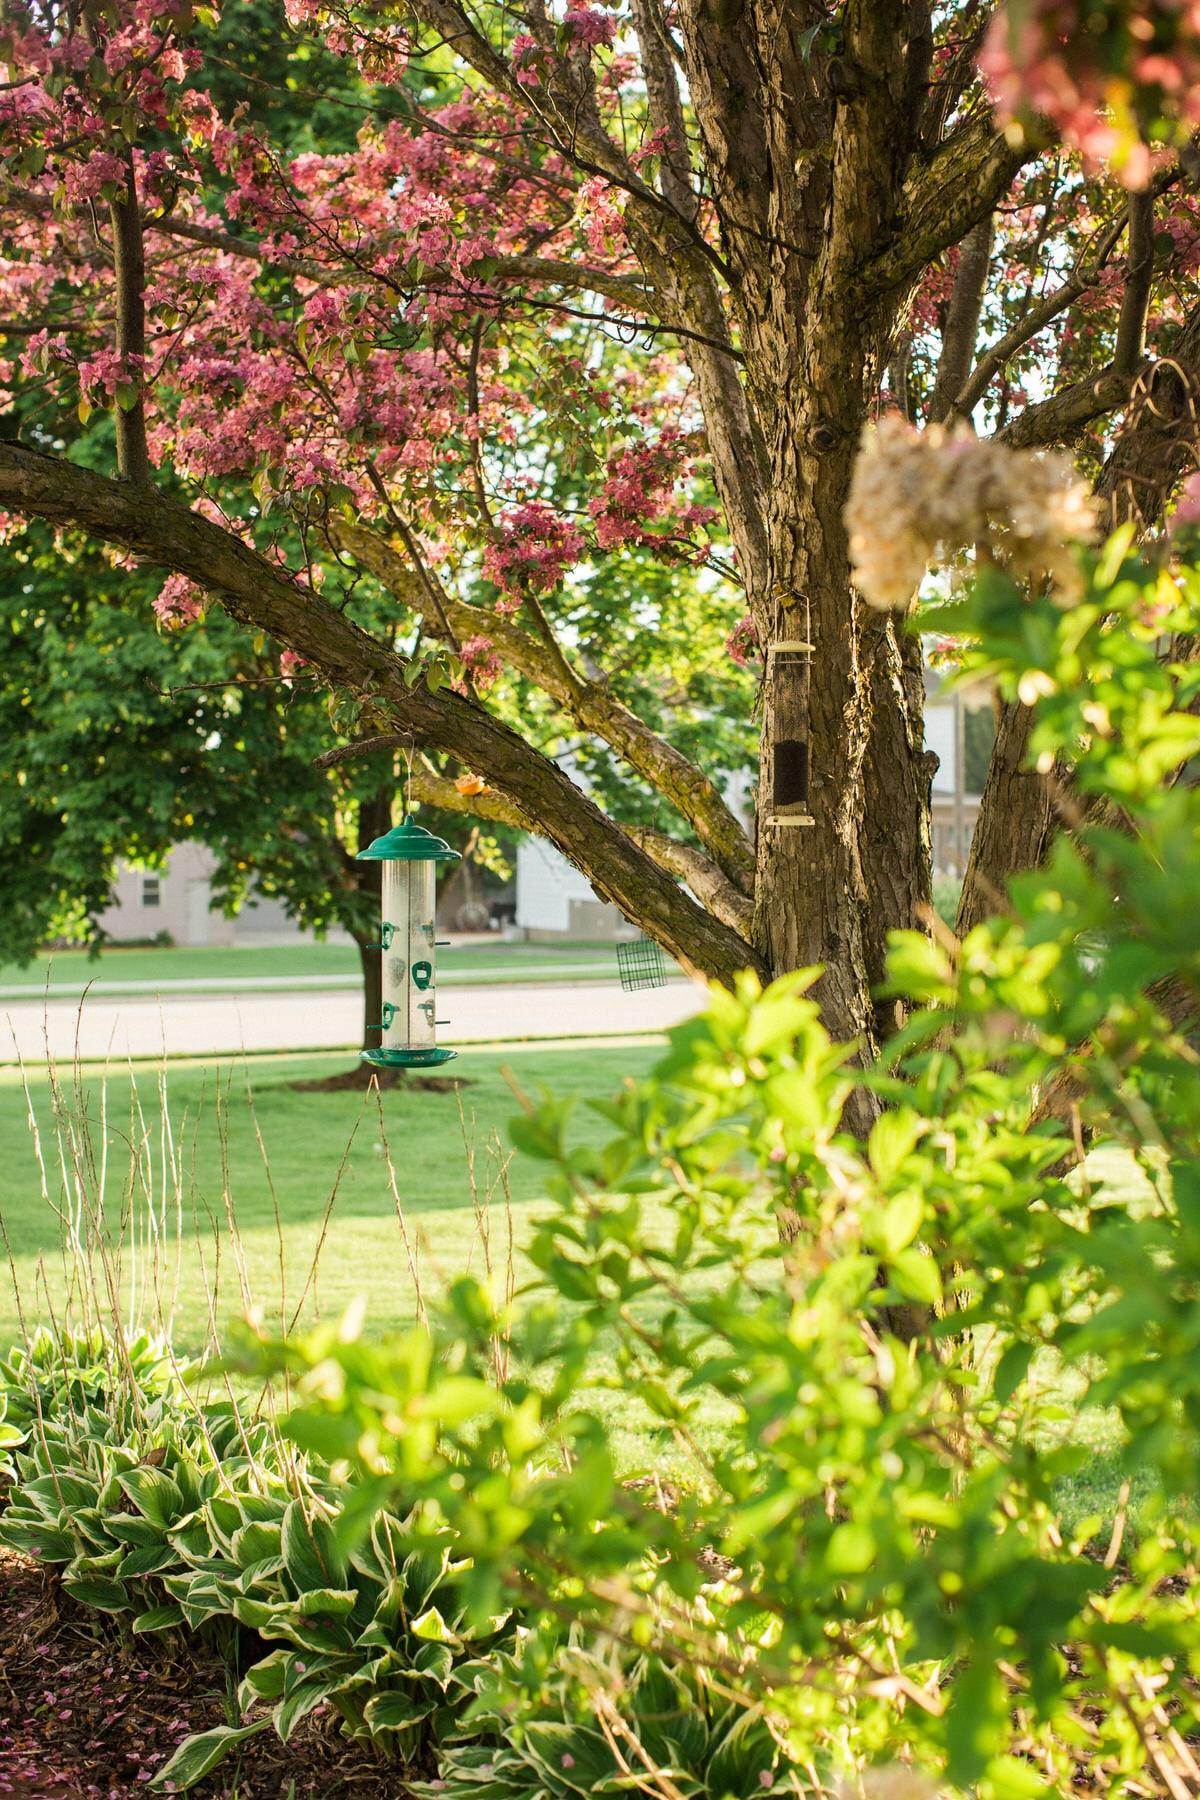 spring-bloom-Wisconsin-fine-art-photography-by-Studio-L-photographer-Laura-Schneider-_5578